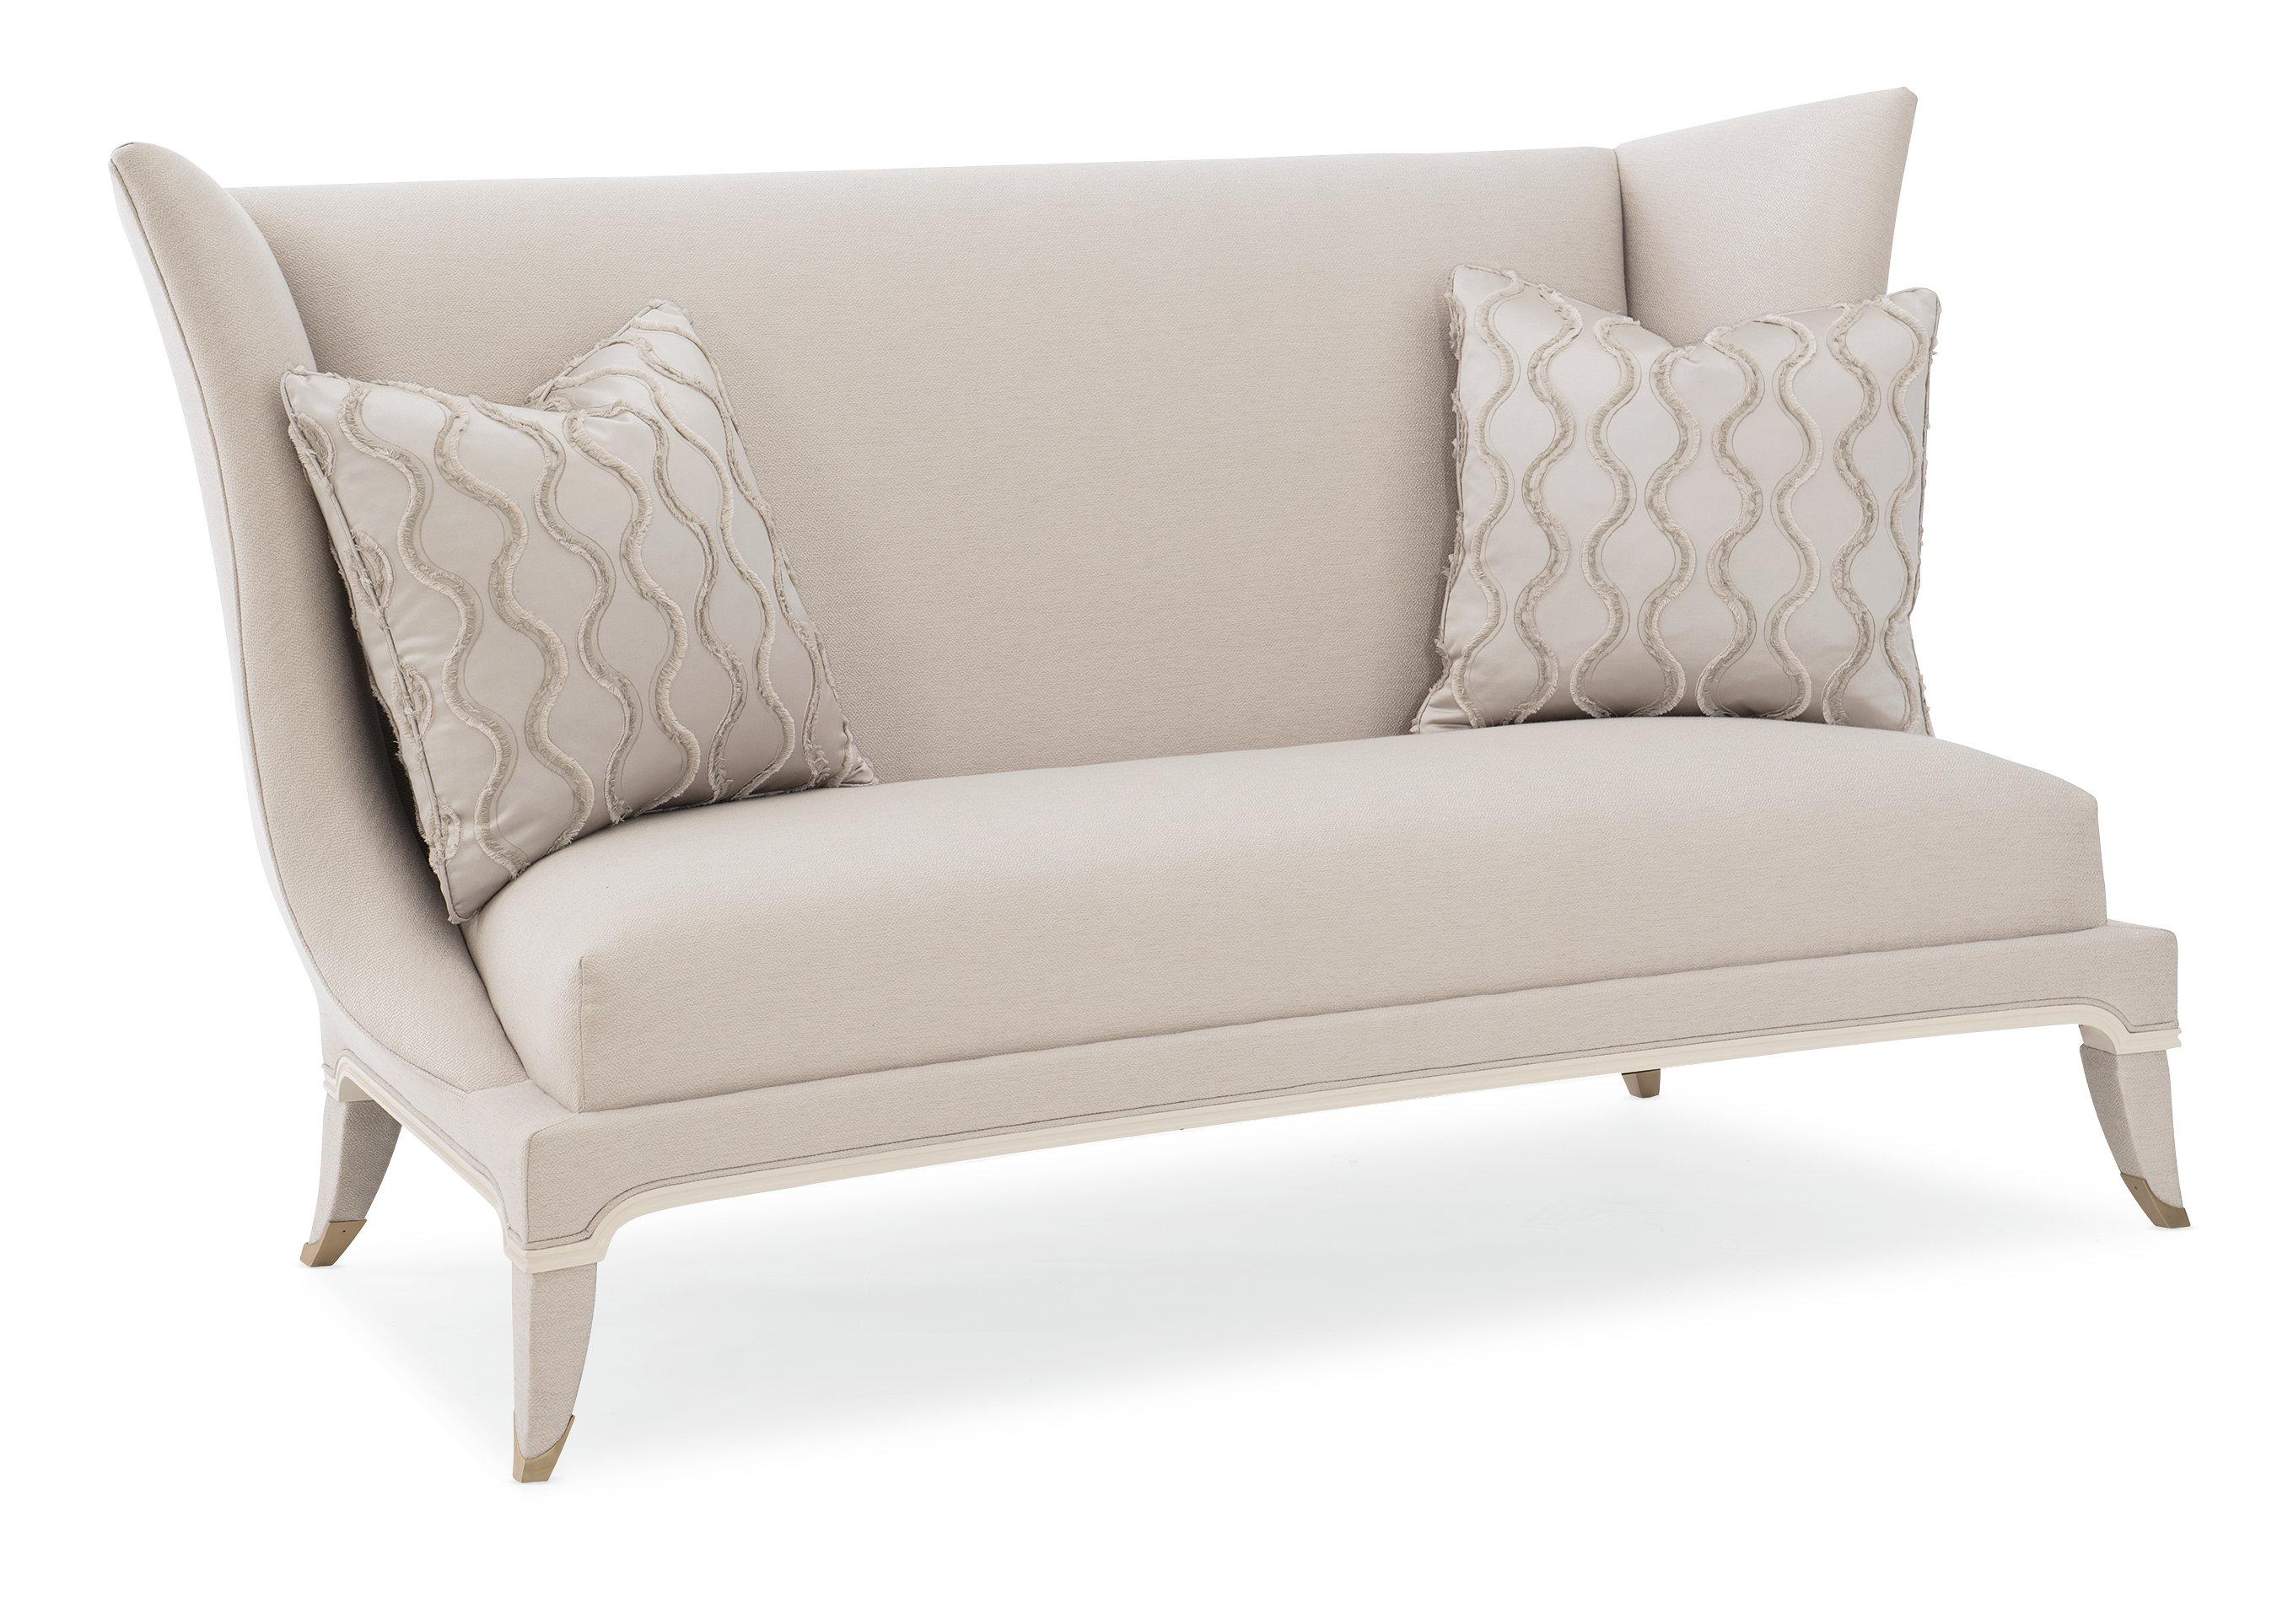 Double Date Wingback Sofa